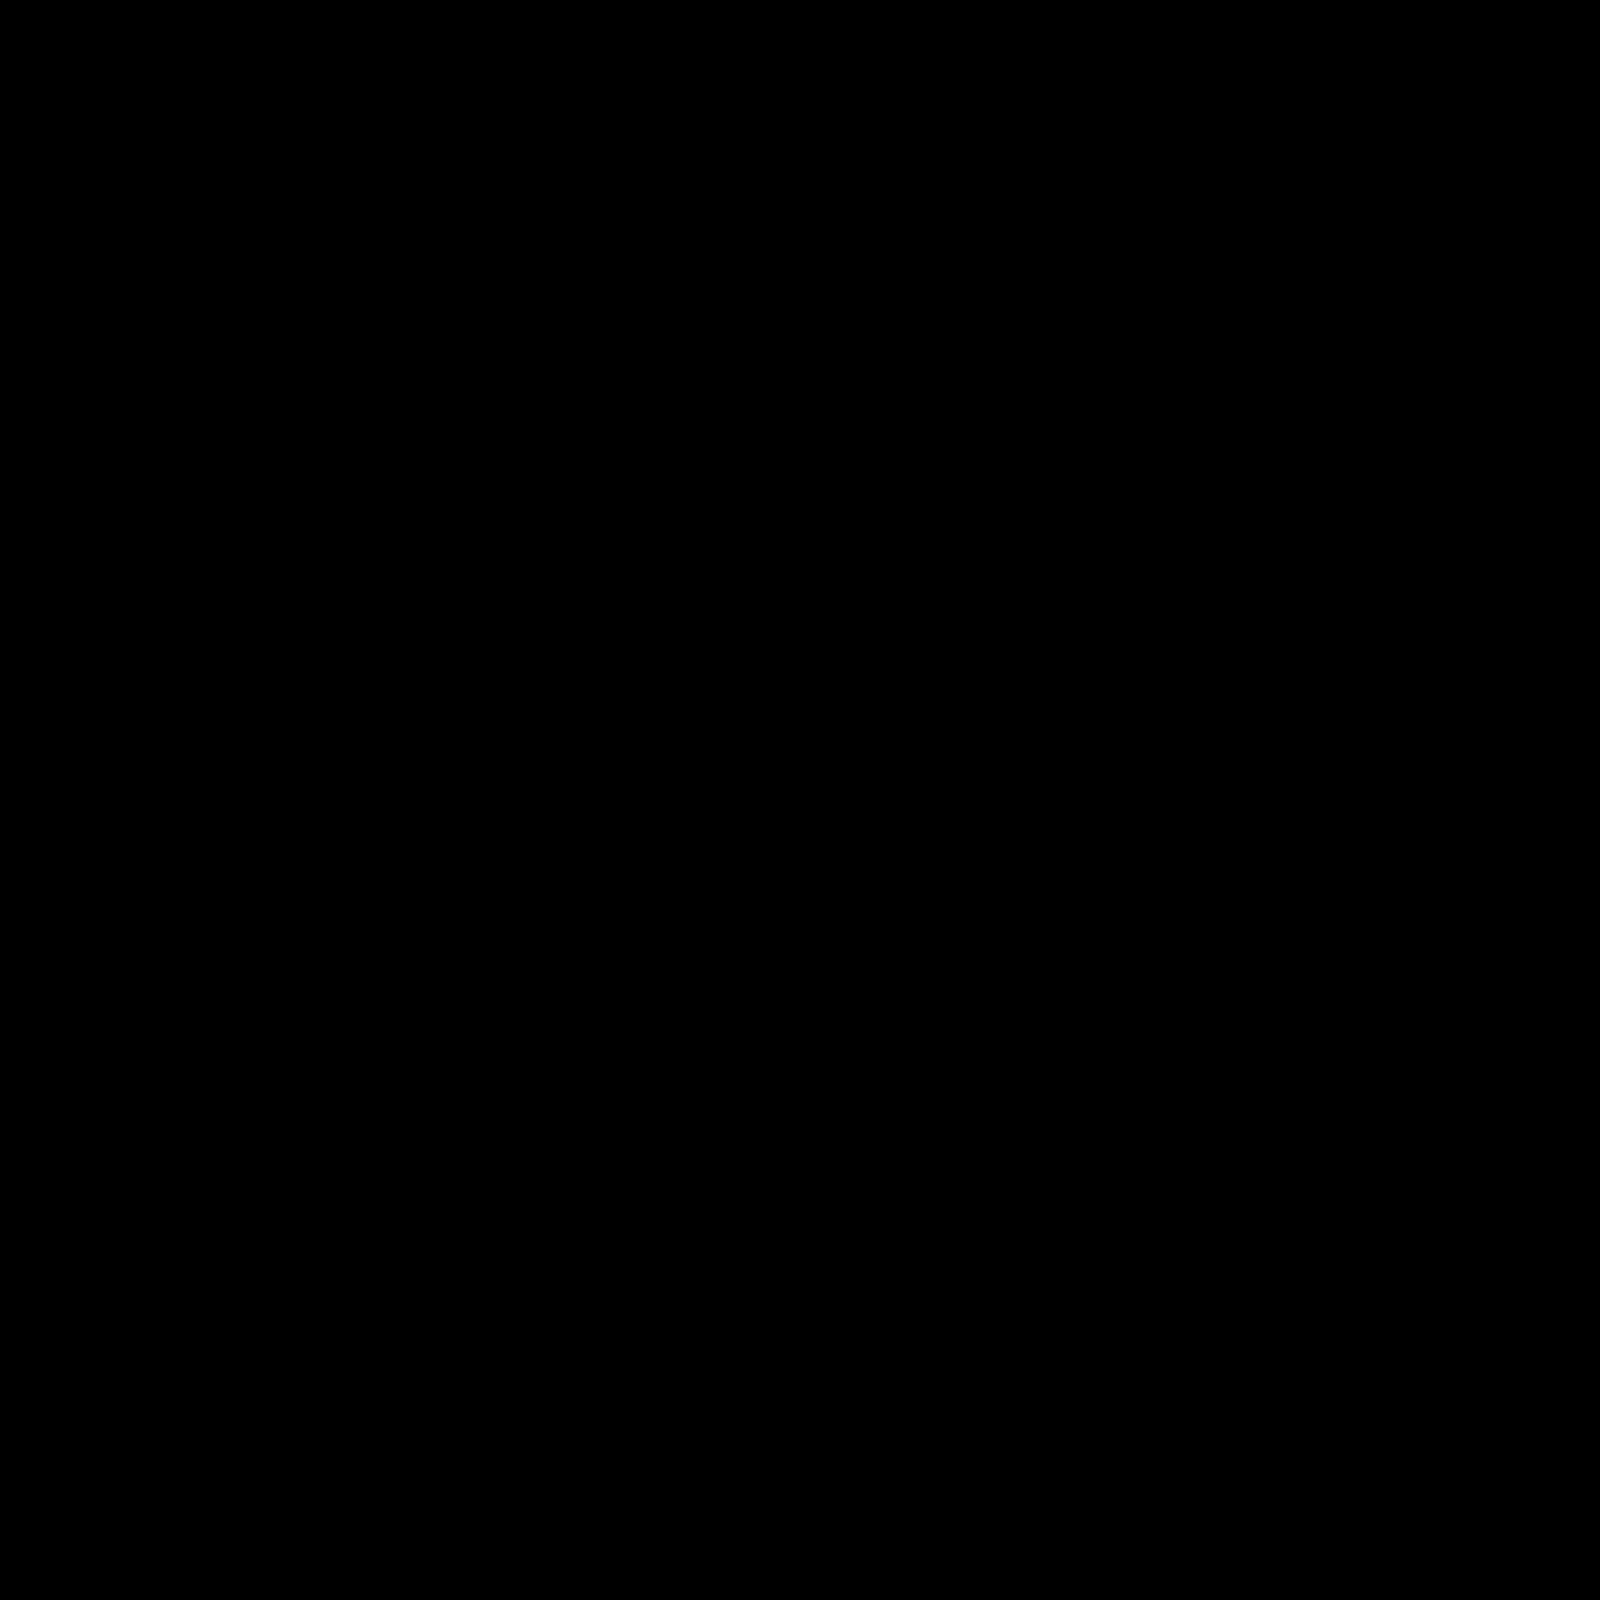 Wampir icon